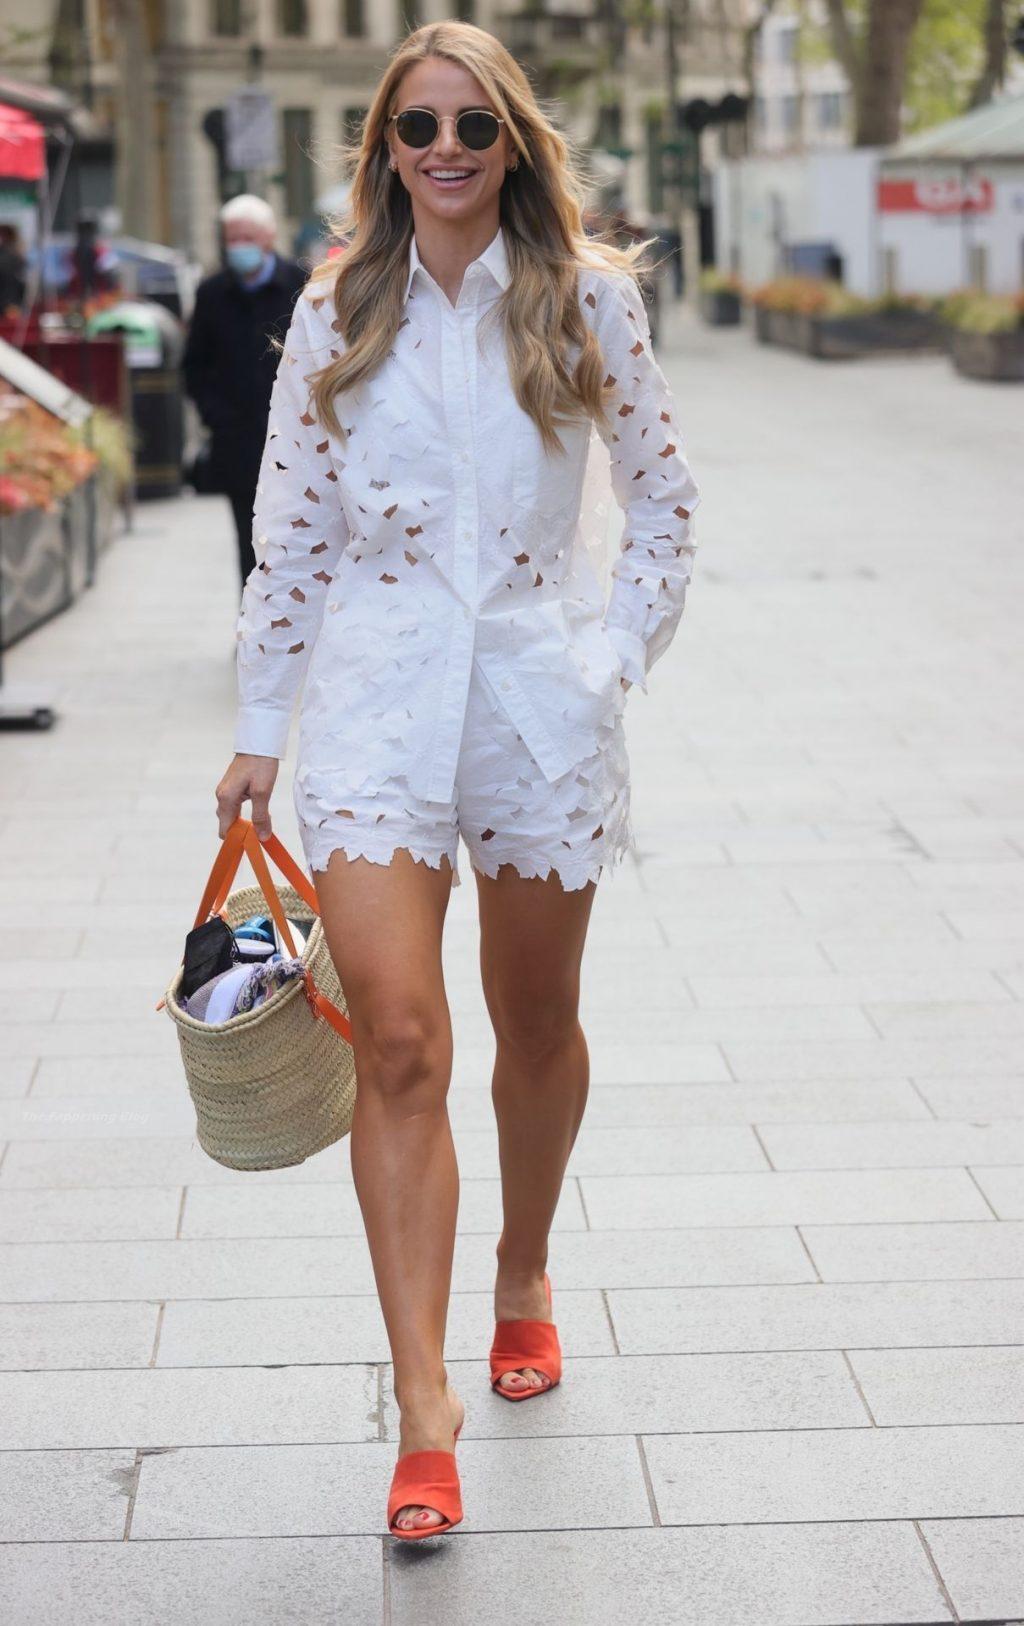 Leggy Vogue Williams Looks Stunning in London (49 Photos)